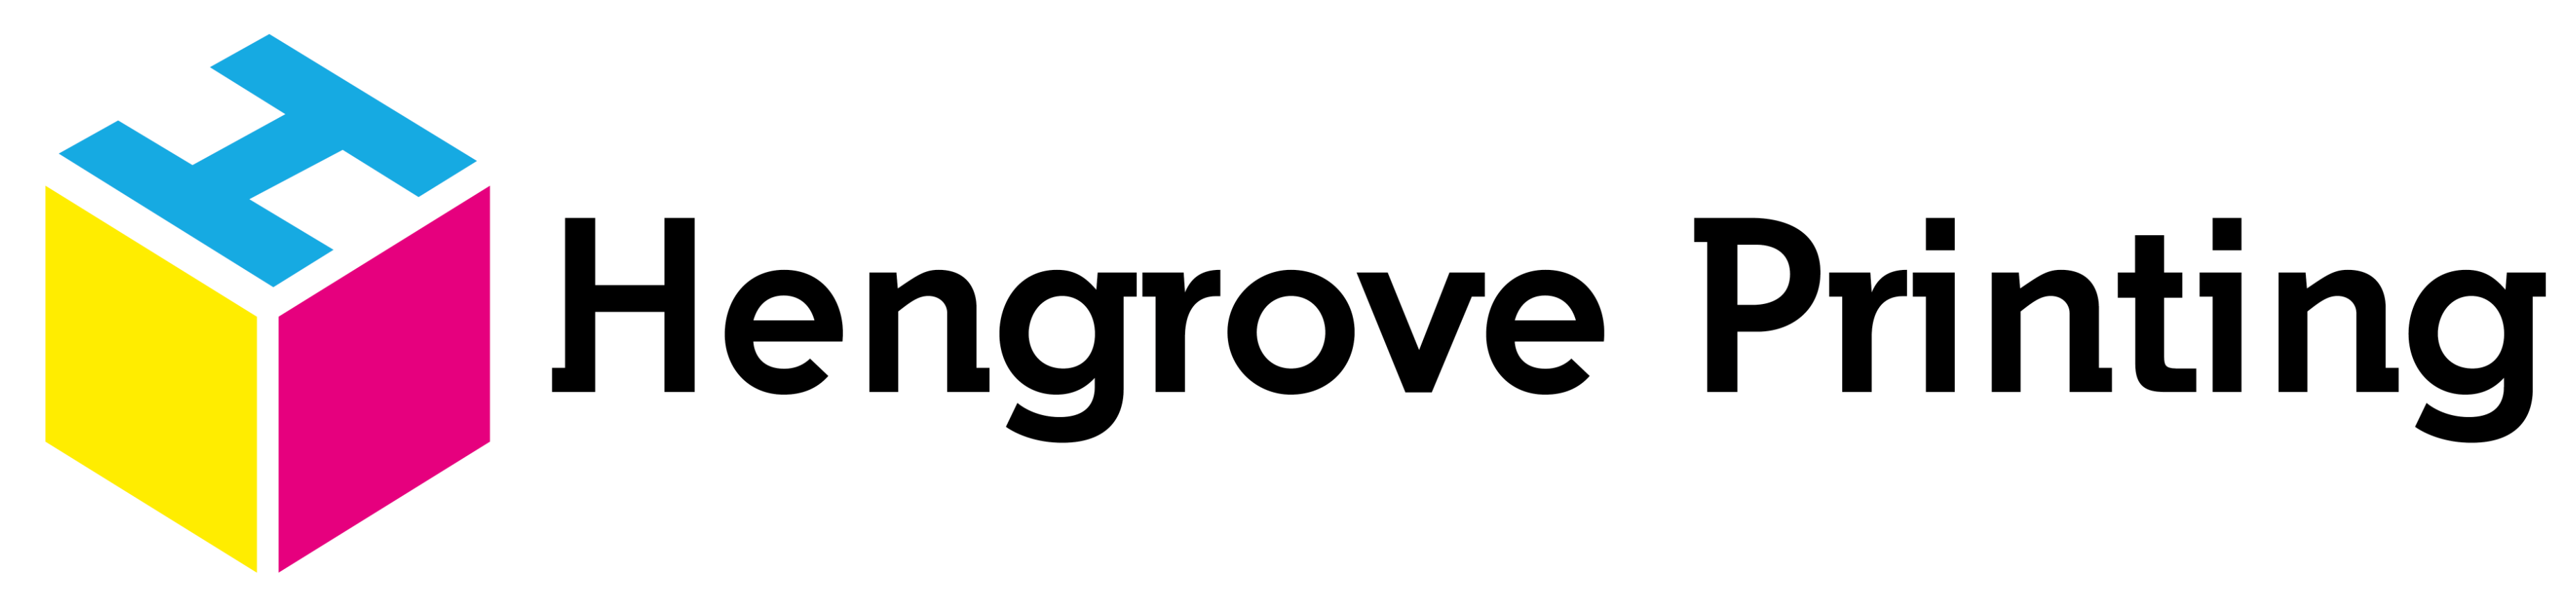 Hengrove Printing